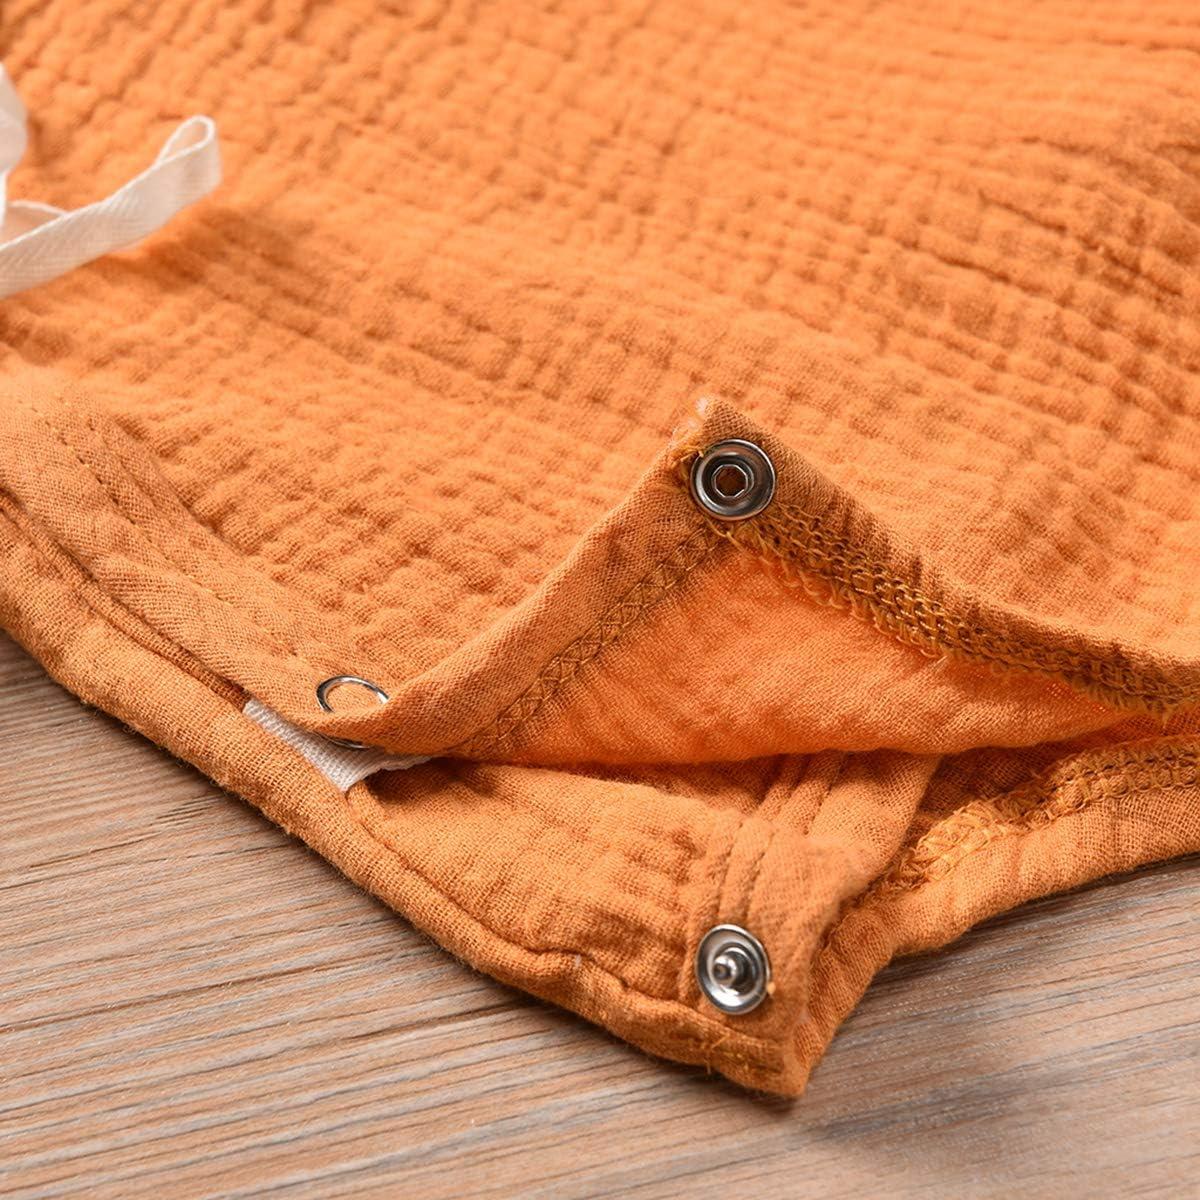 Tianhaik Combinaison-Jersey /à Manches Courtes en Pur Coton pour b/éb/é Kimono//Kimono